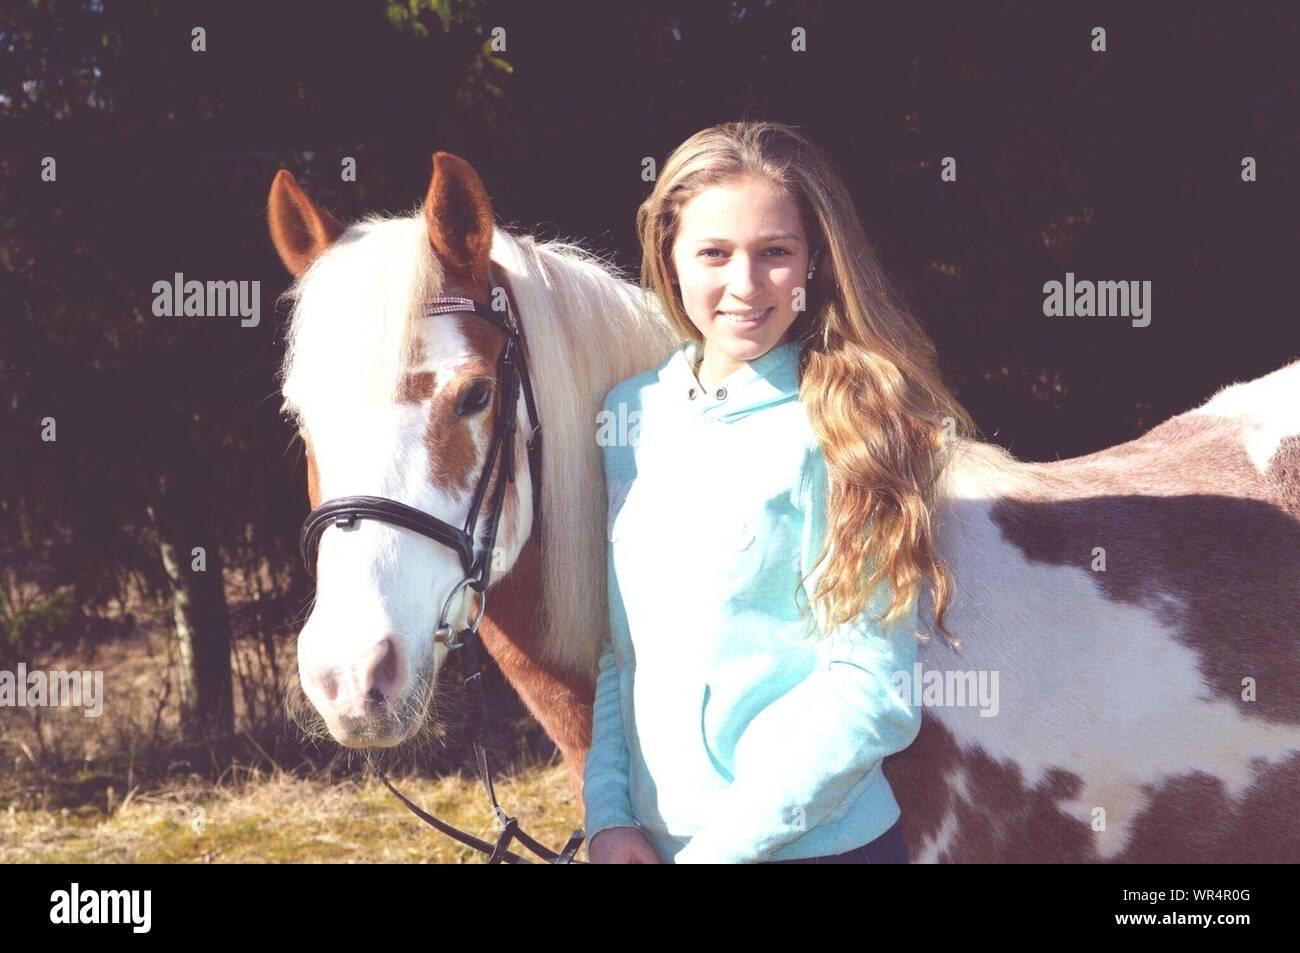 Retrato de mujer sonriente a caballo en campo permanente Foto de stock